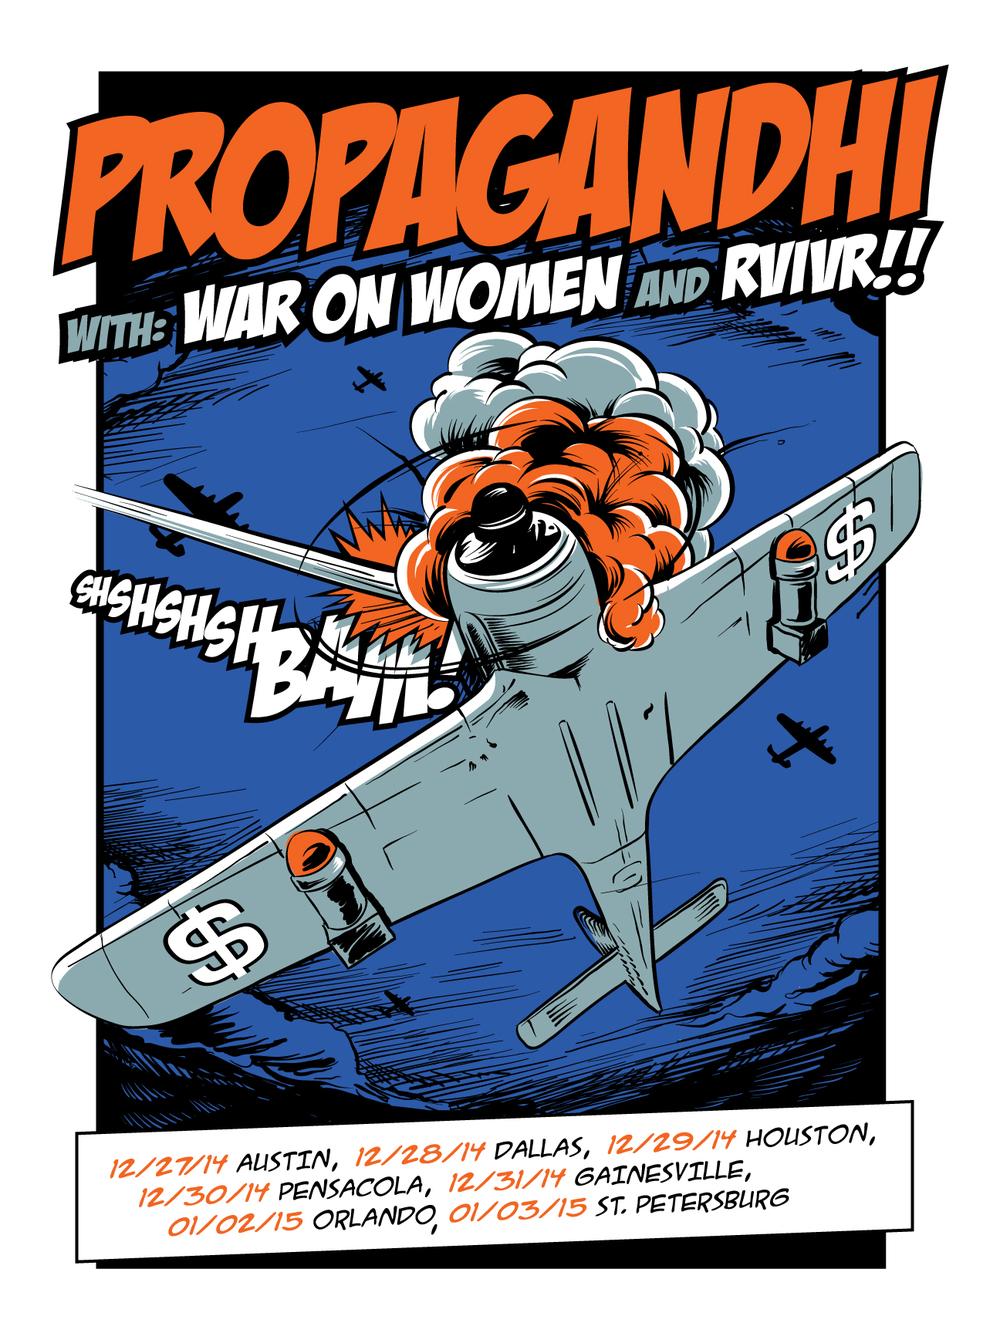 propagandhiSOUTH2014.jpg